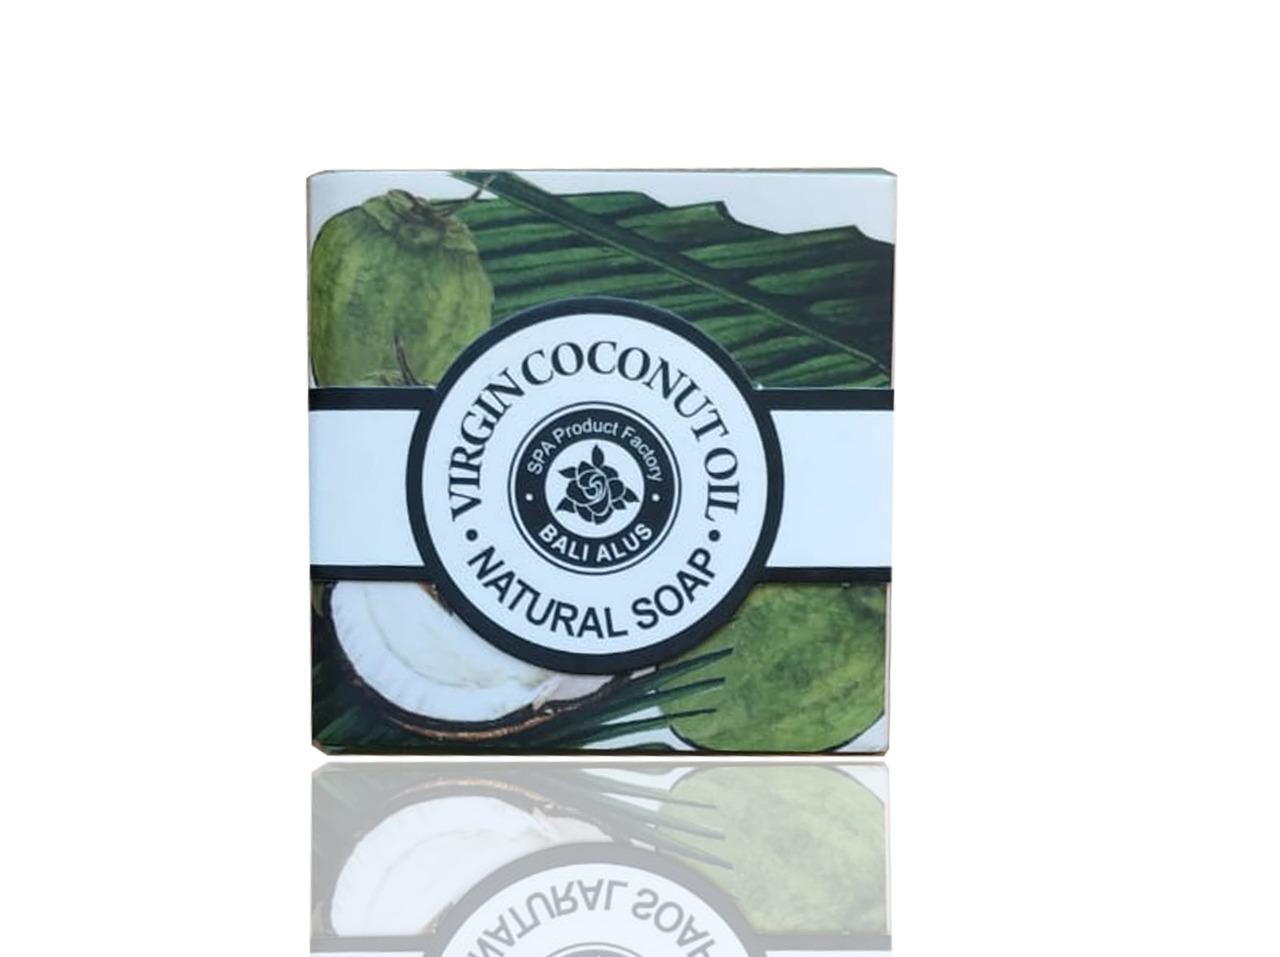 Natural Soap Virgin Coconut oil